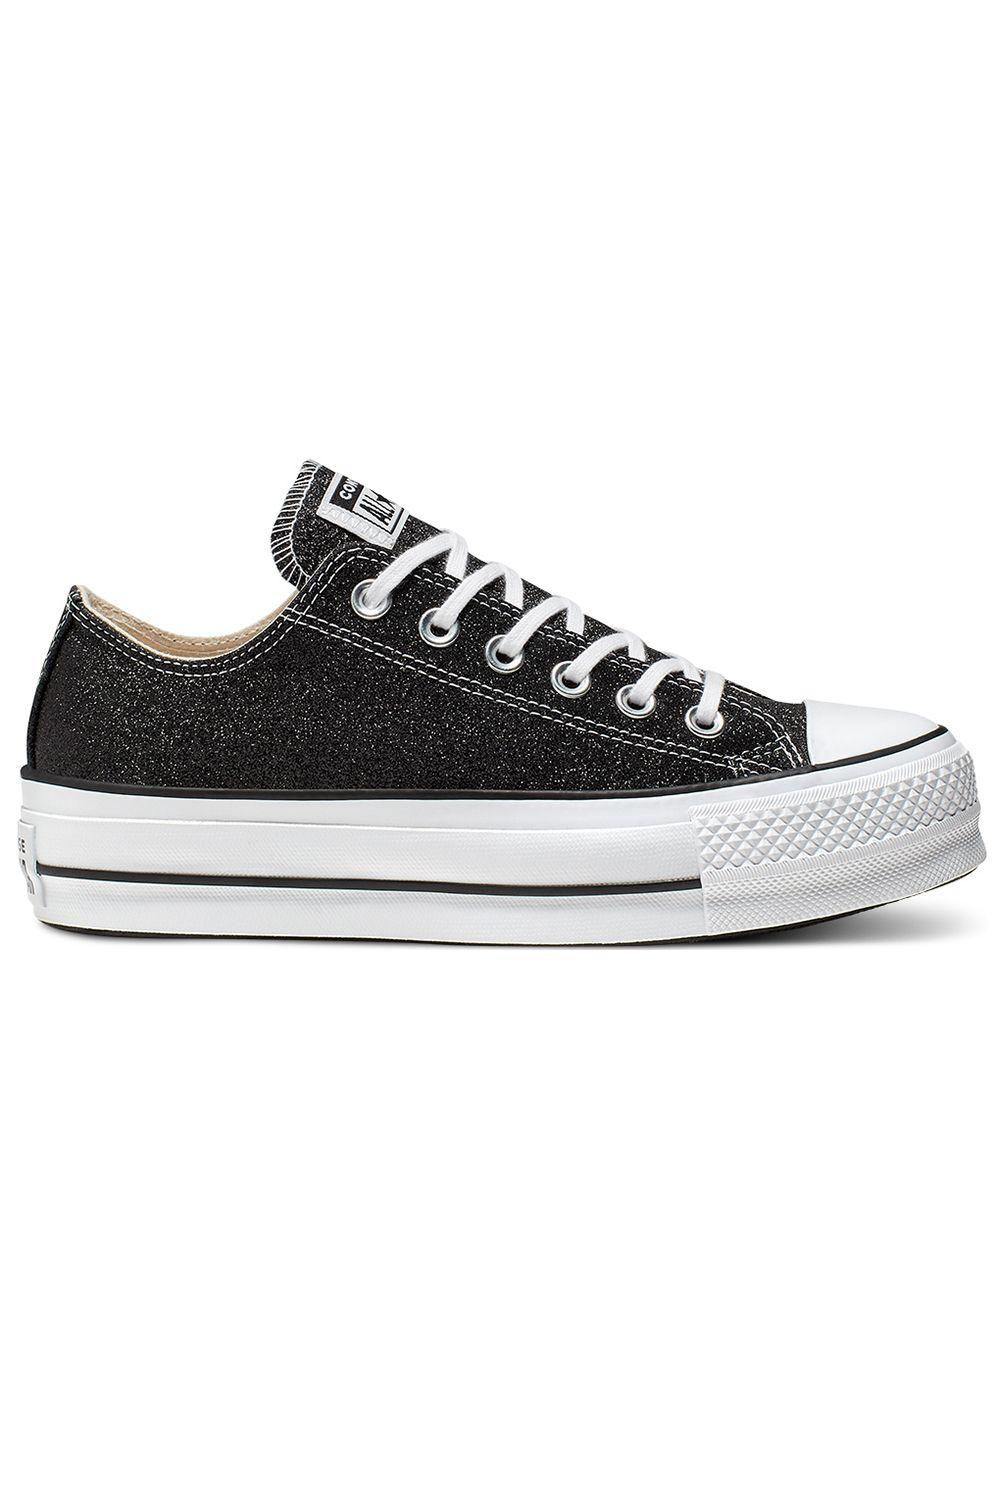 Converse Shoes CHUCK TAYLOR ALL STAR LIFT - OX Black/White/Black